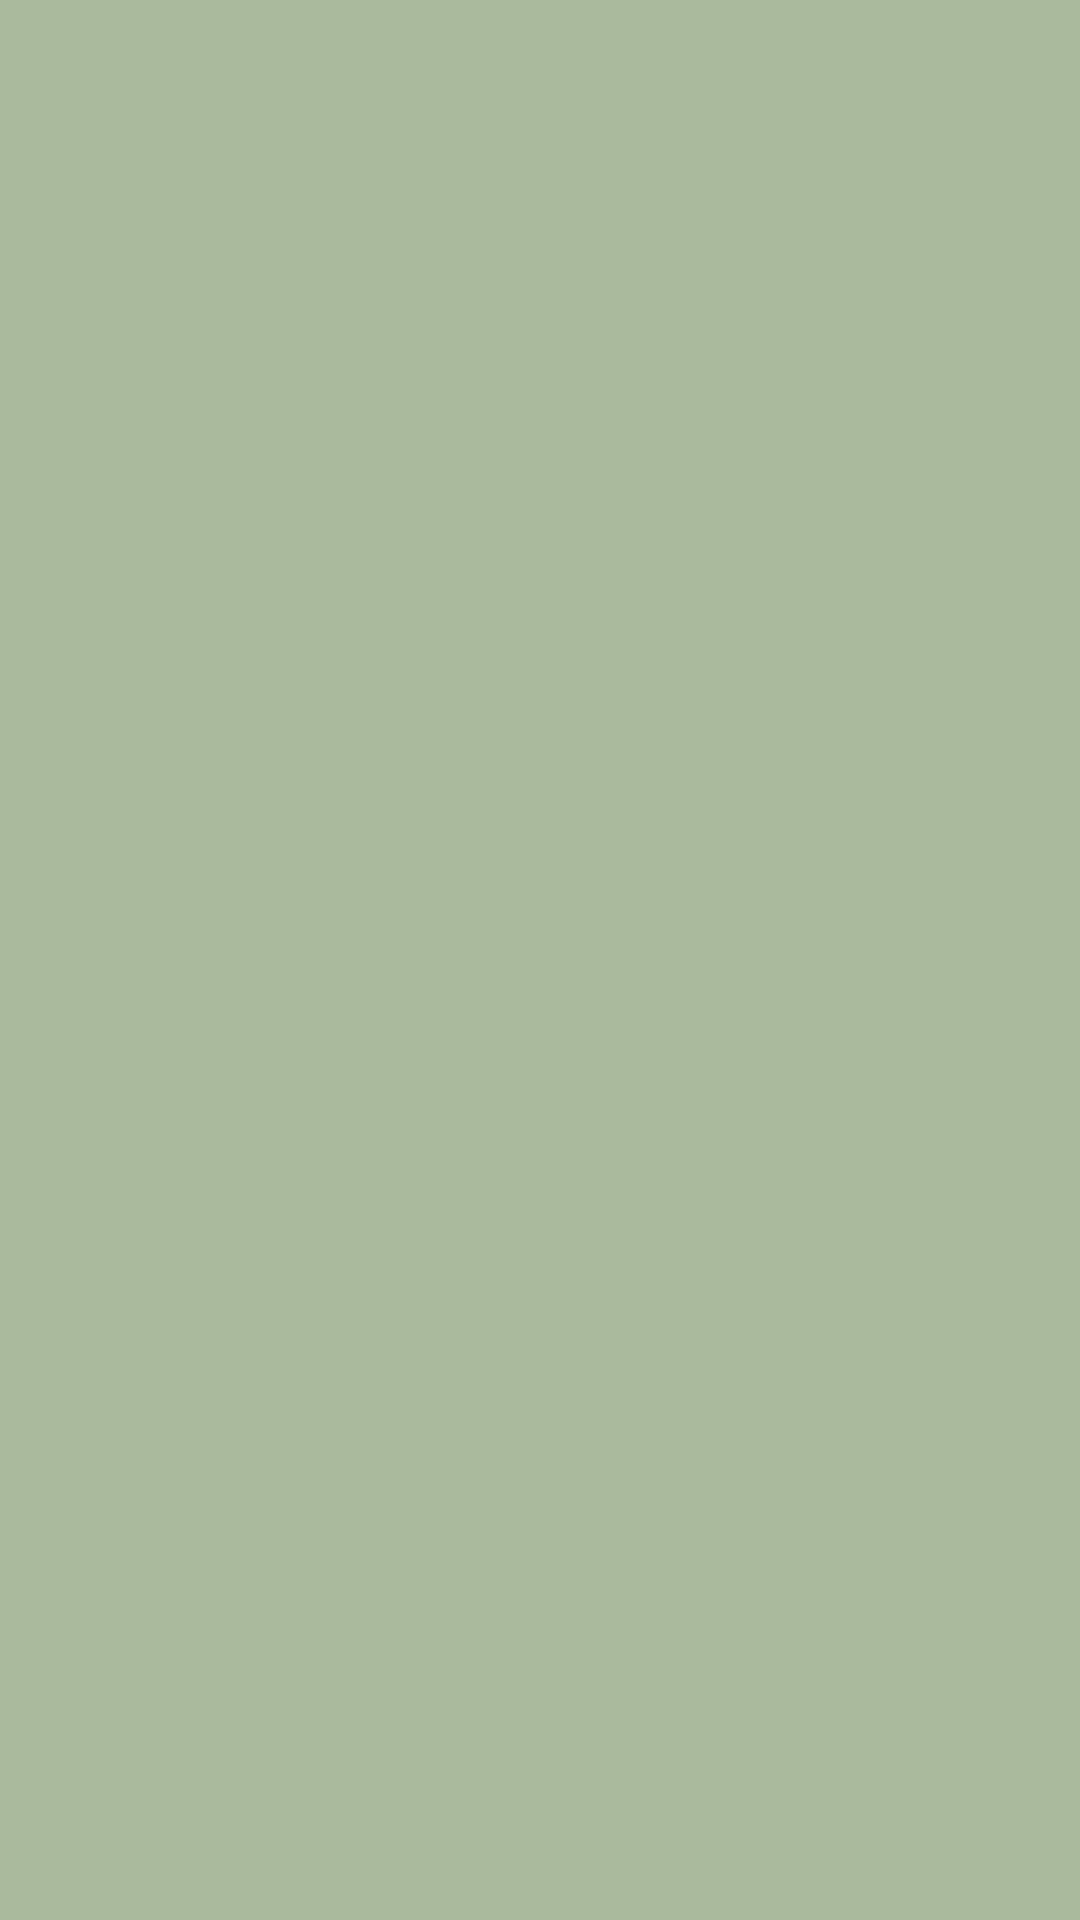 1080x1920 Laurel Green Solid Color Background